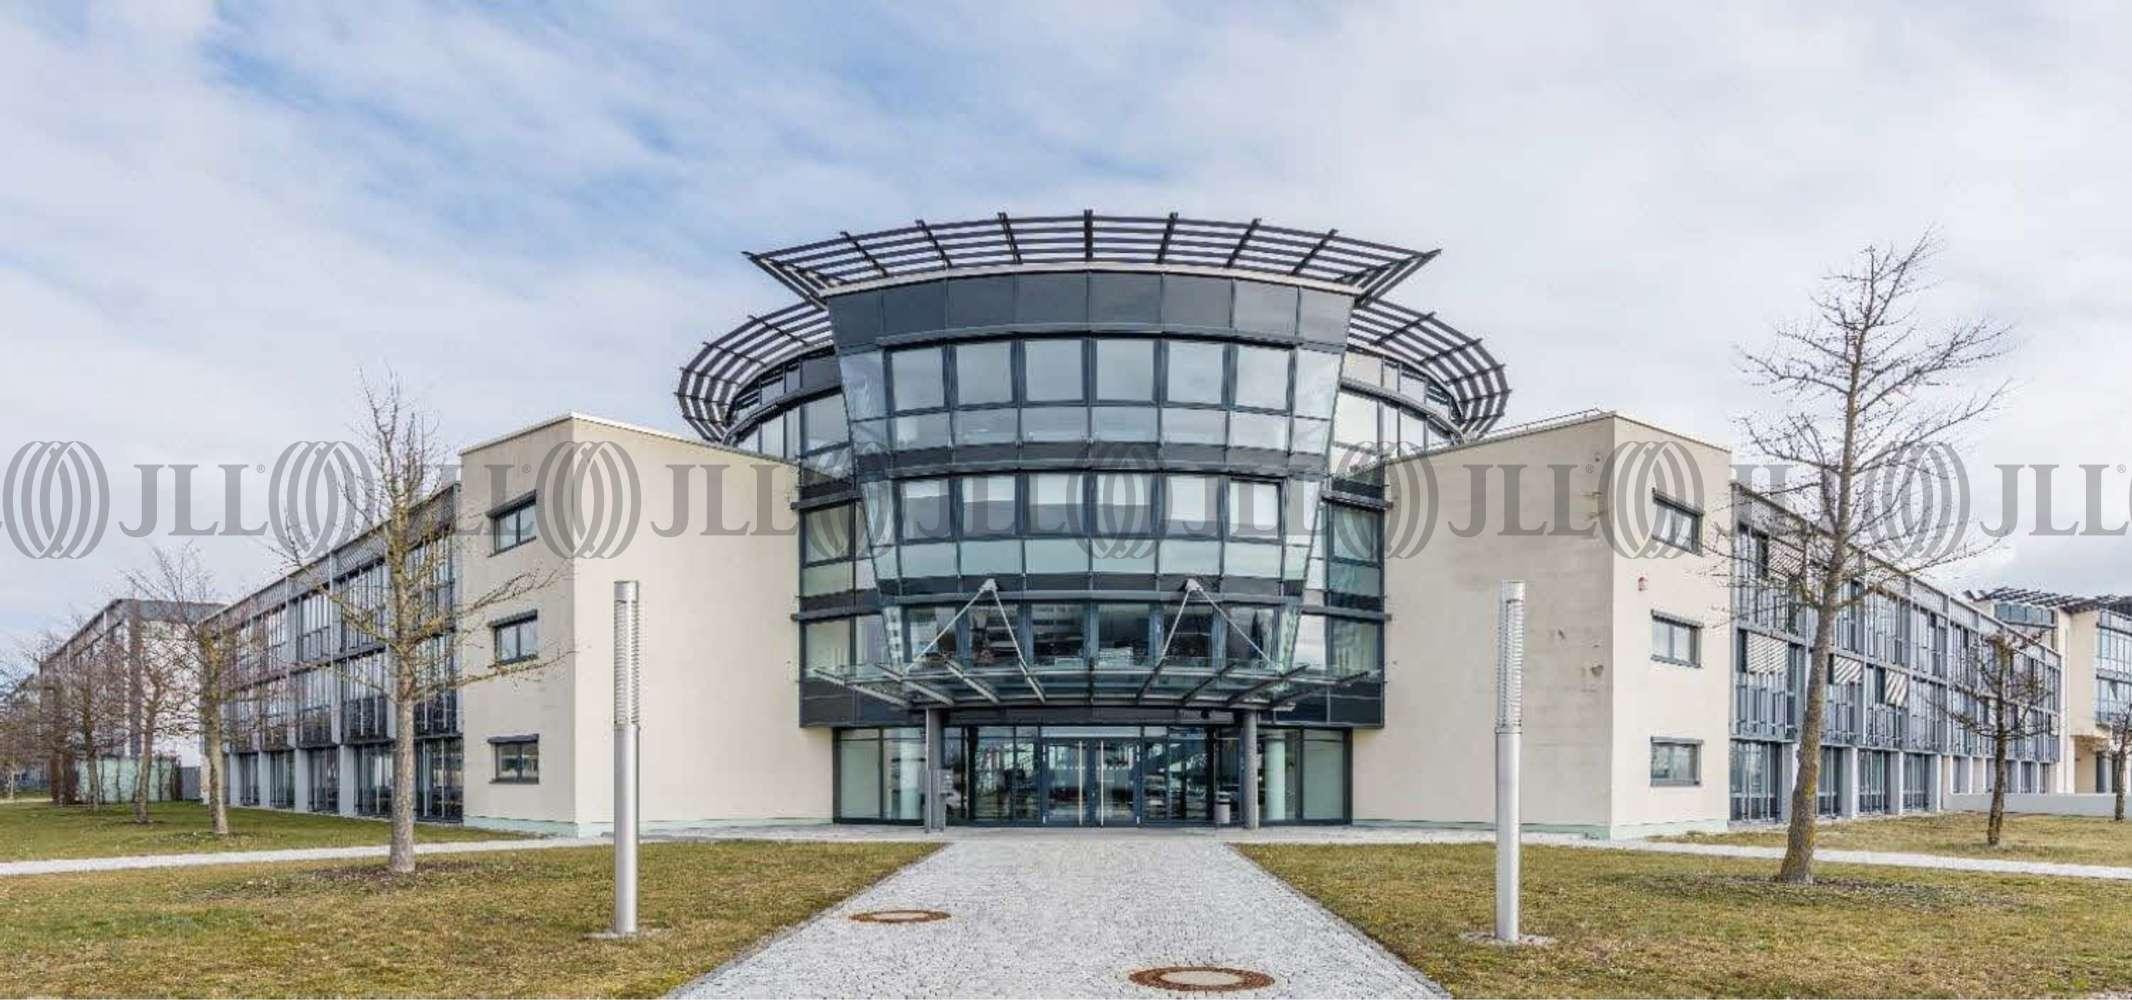 Büros Oberding, 85445 - Büro - Oberding, Schwaig - M1187 - 9991060